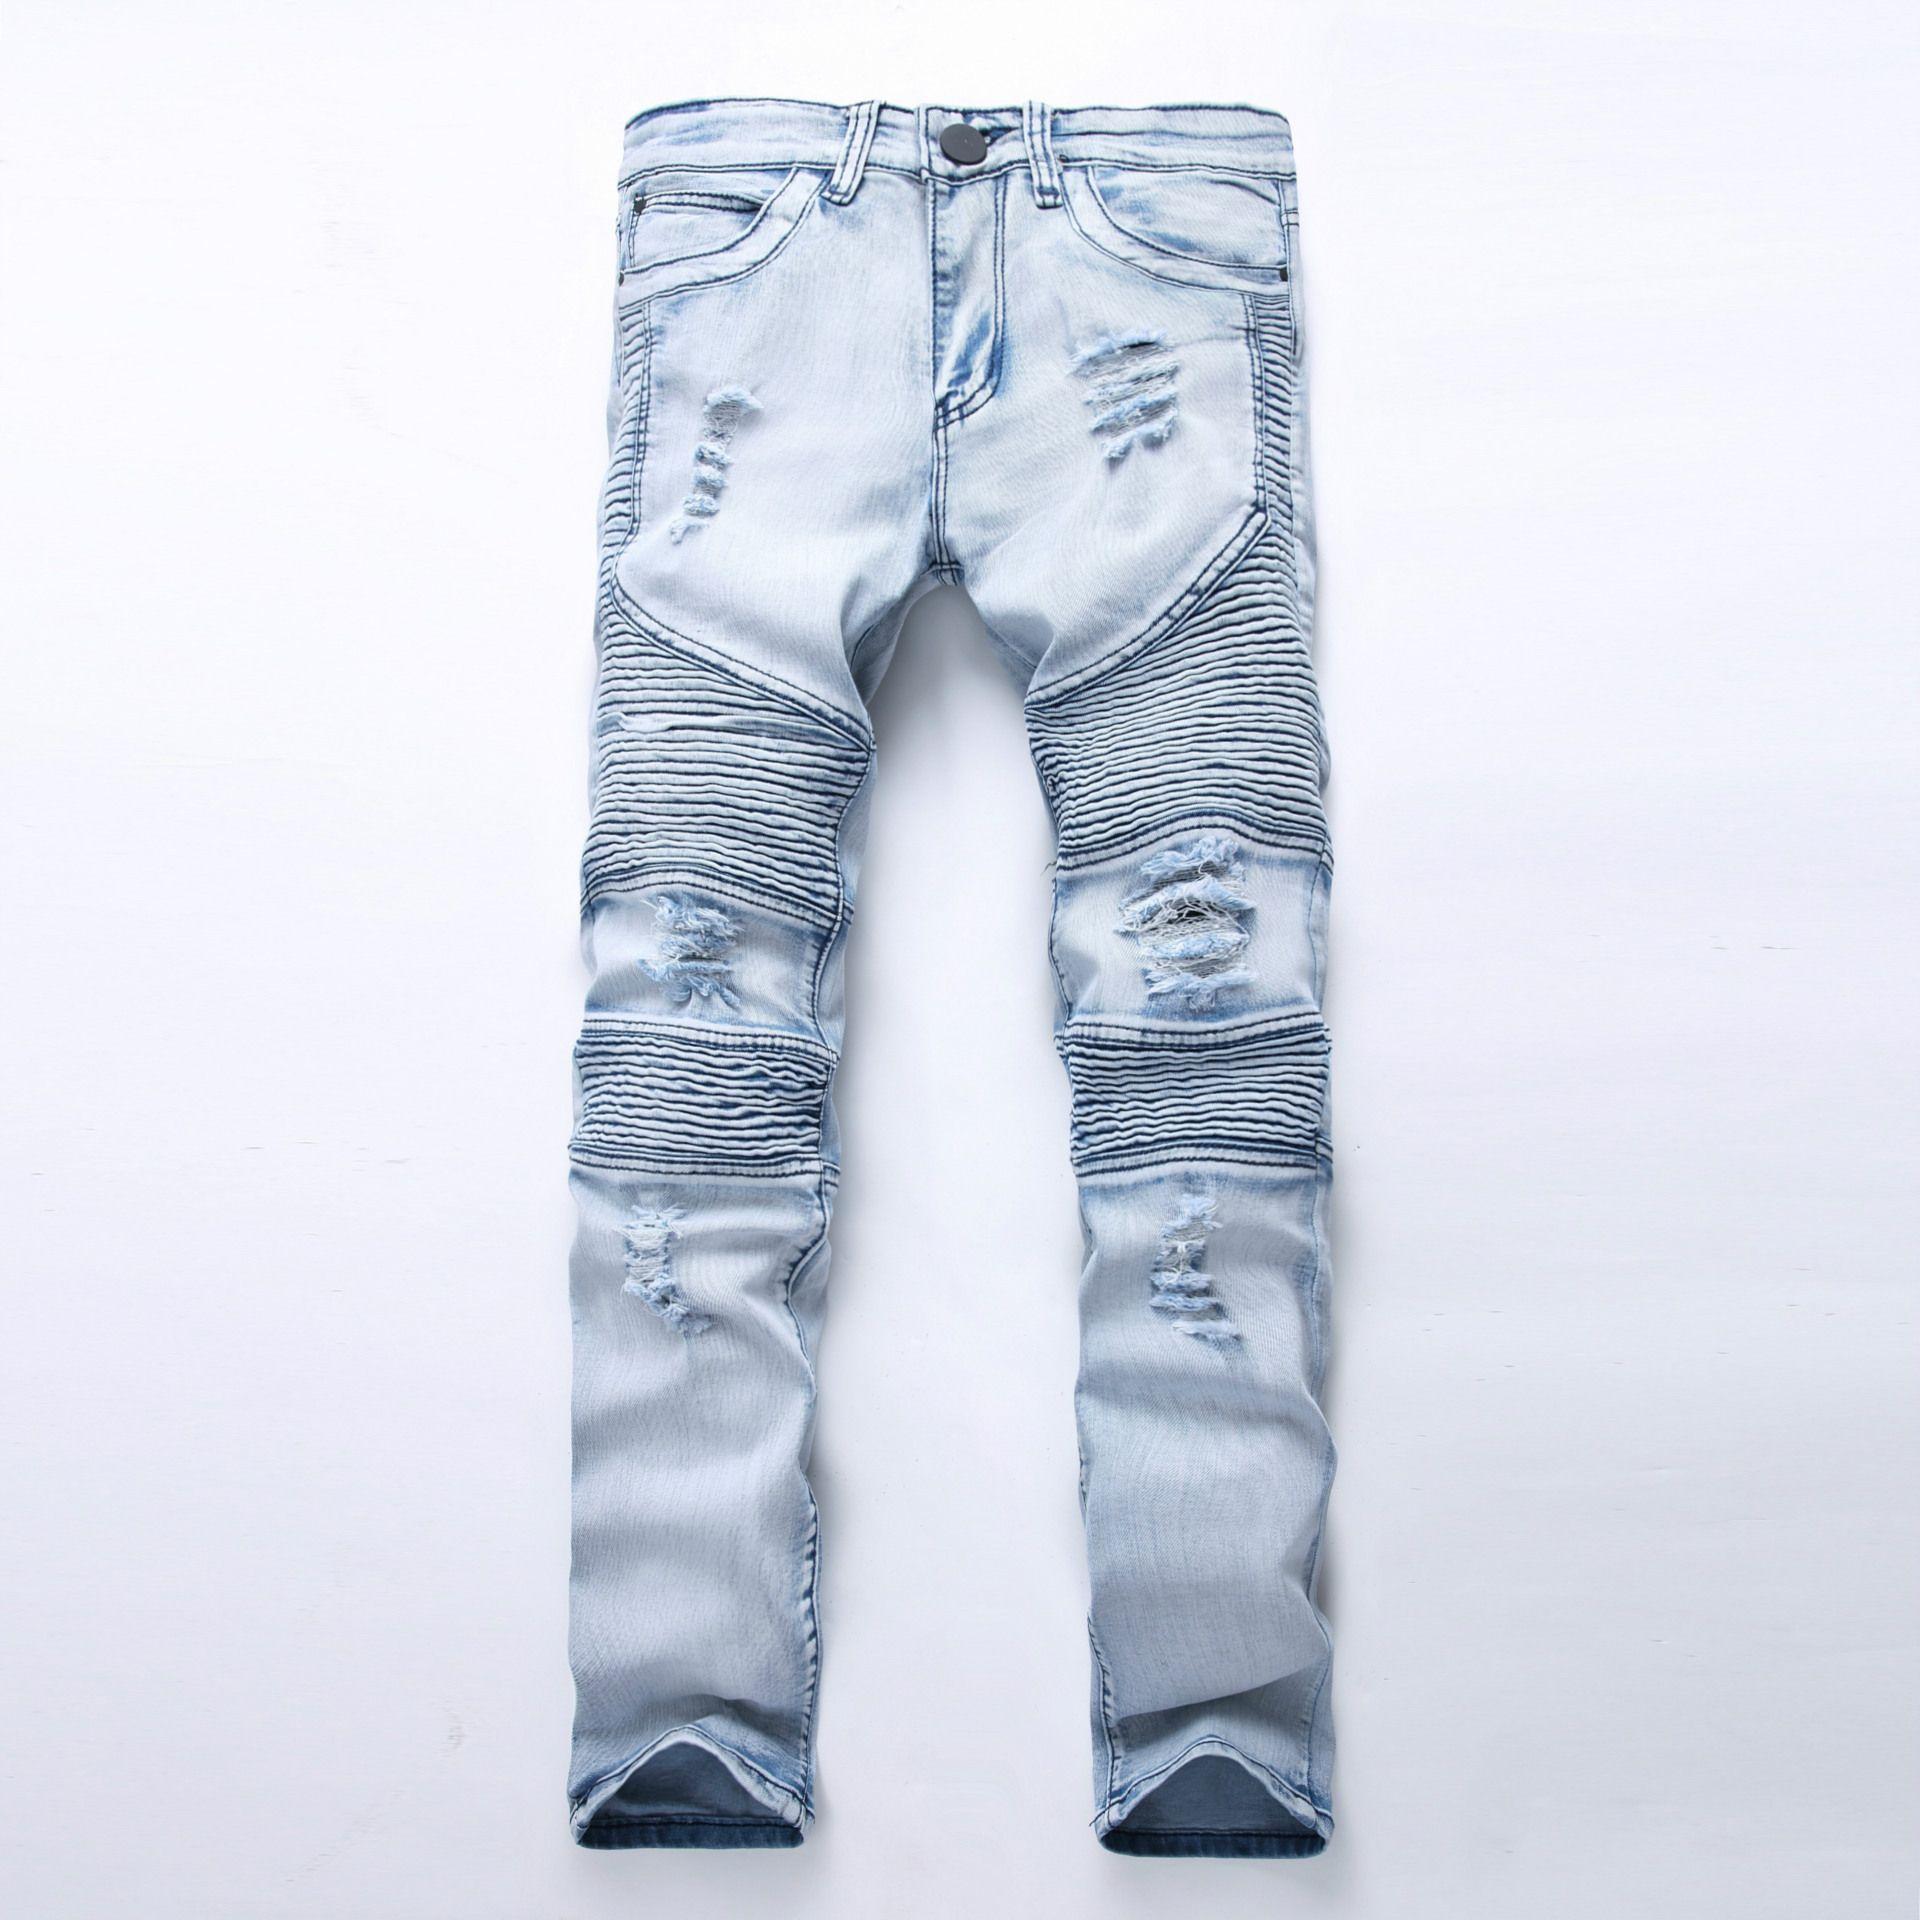 Compre Hombres Biker Jeans Ripped Denim Pantalones De Motocicleta ...